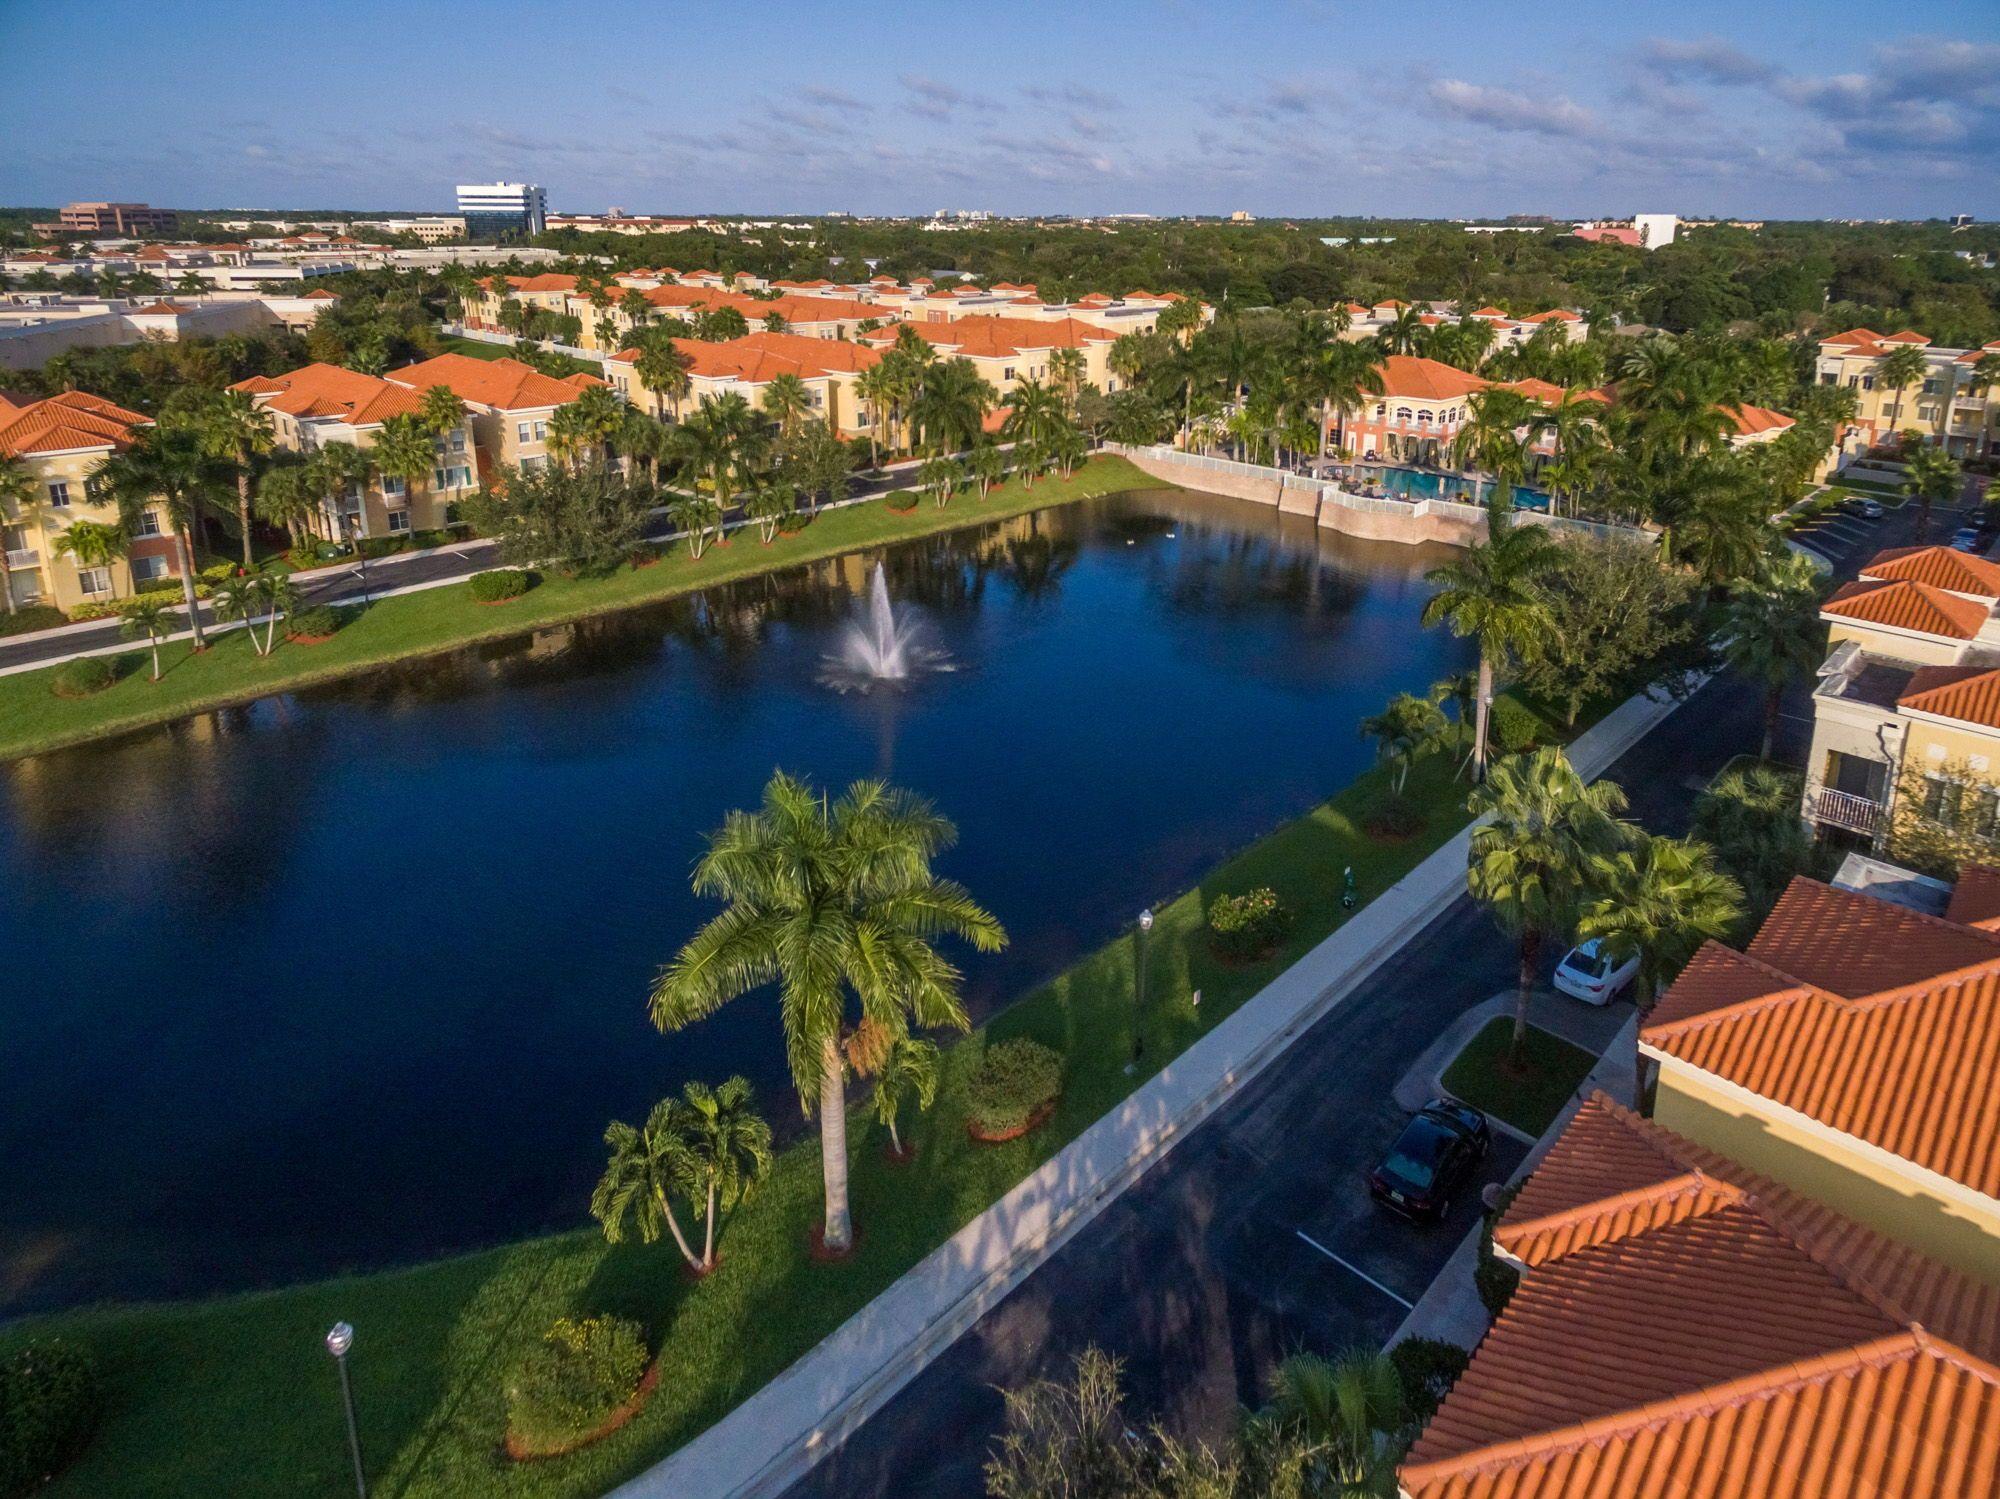 0cdb1ca95b385973864f4dbb8f4fccd5 - Legacy Place Condominiums Palm Beach Gardens